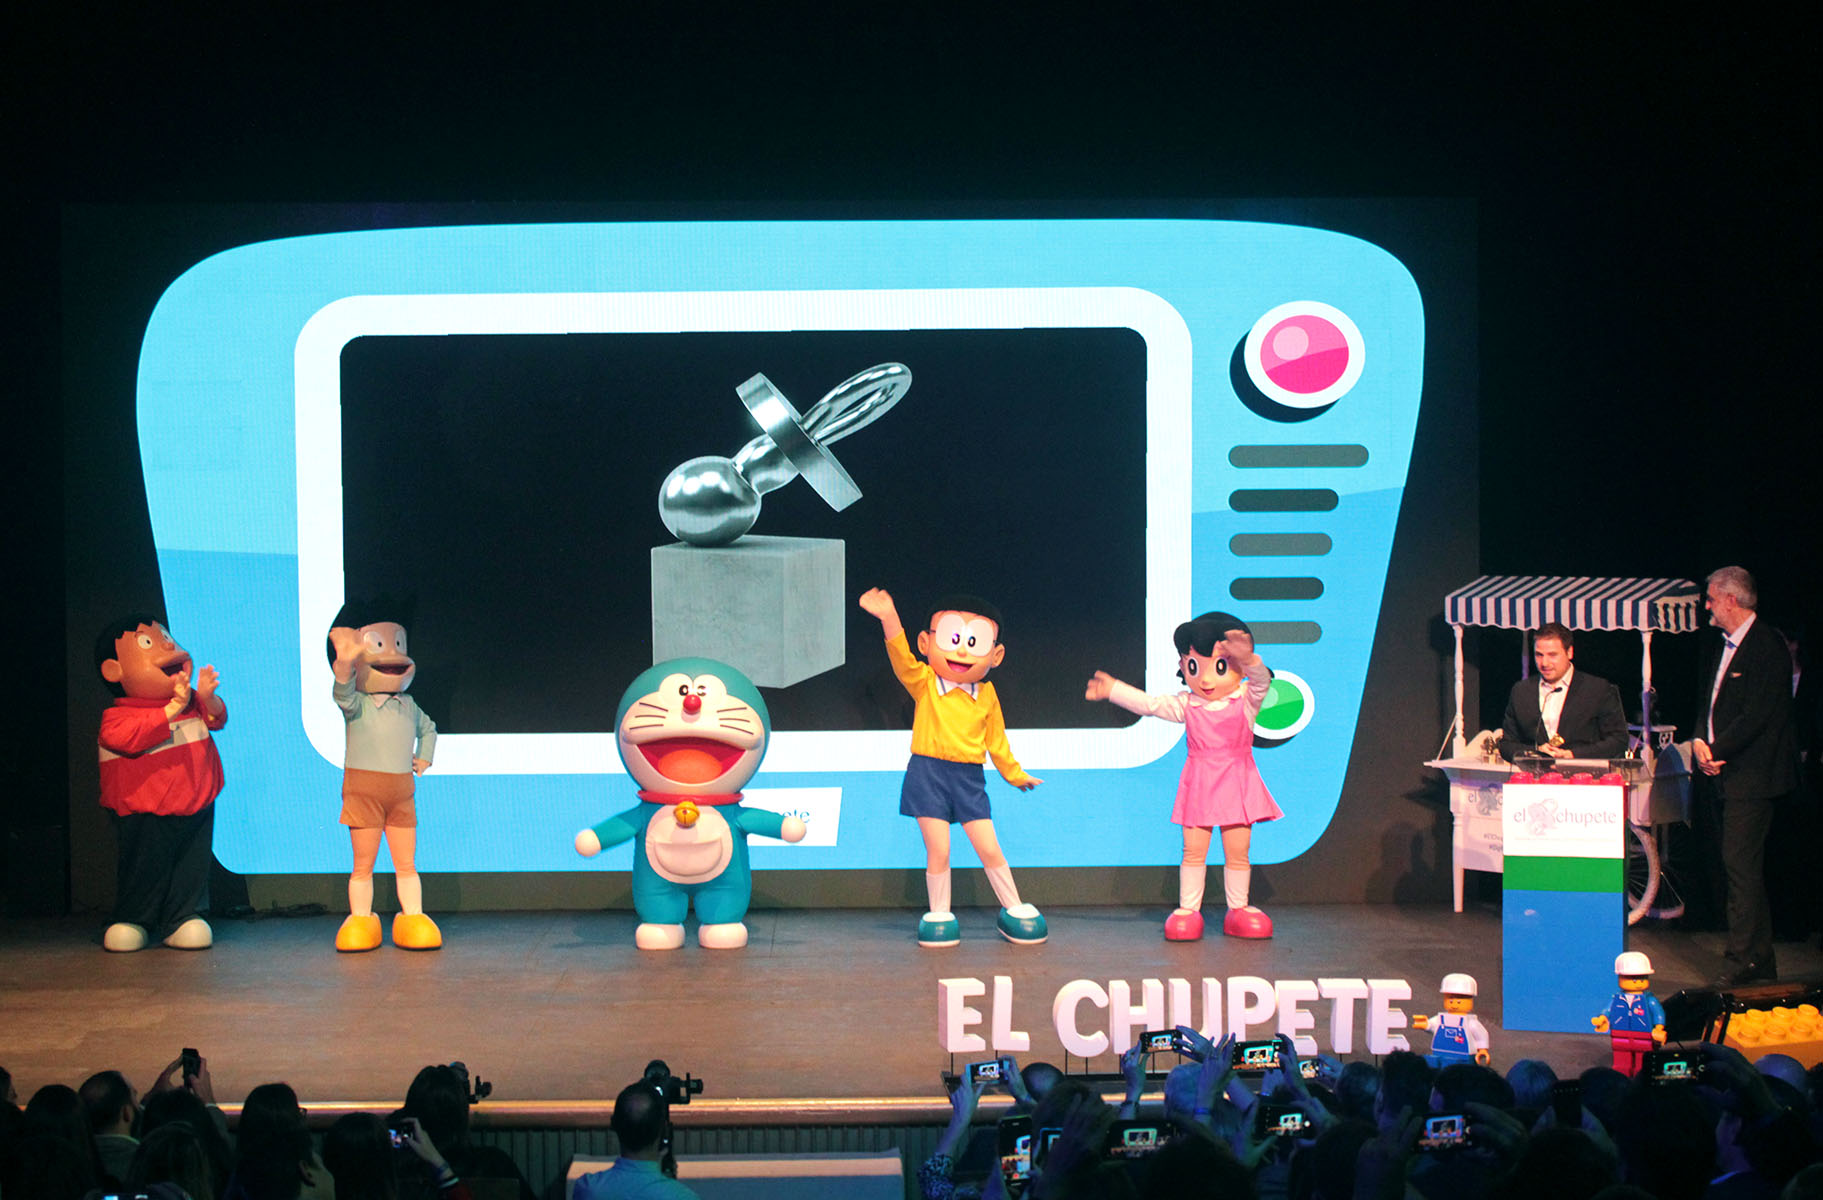 Premio-El-Chupete-1.jpg